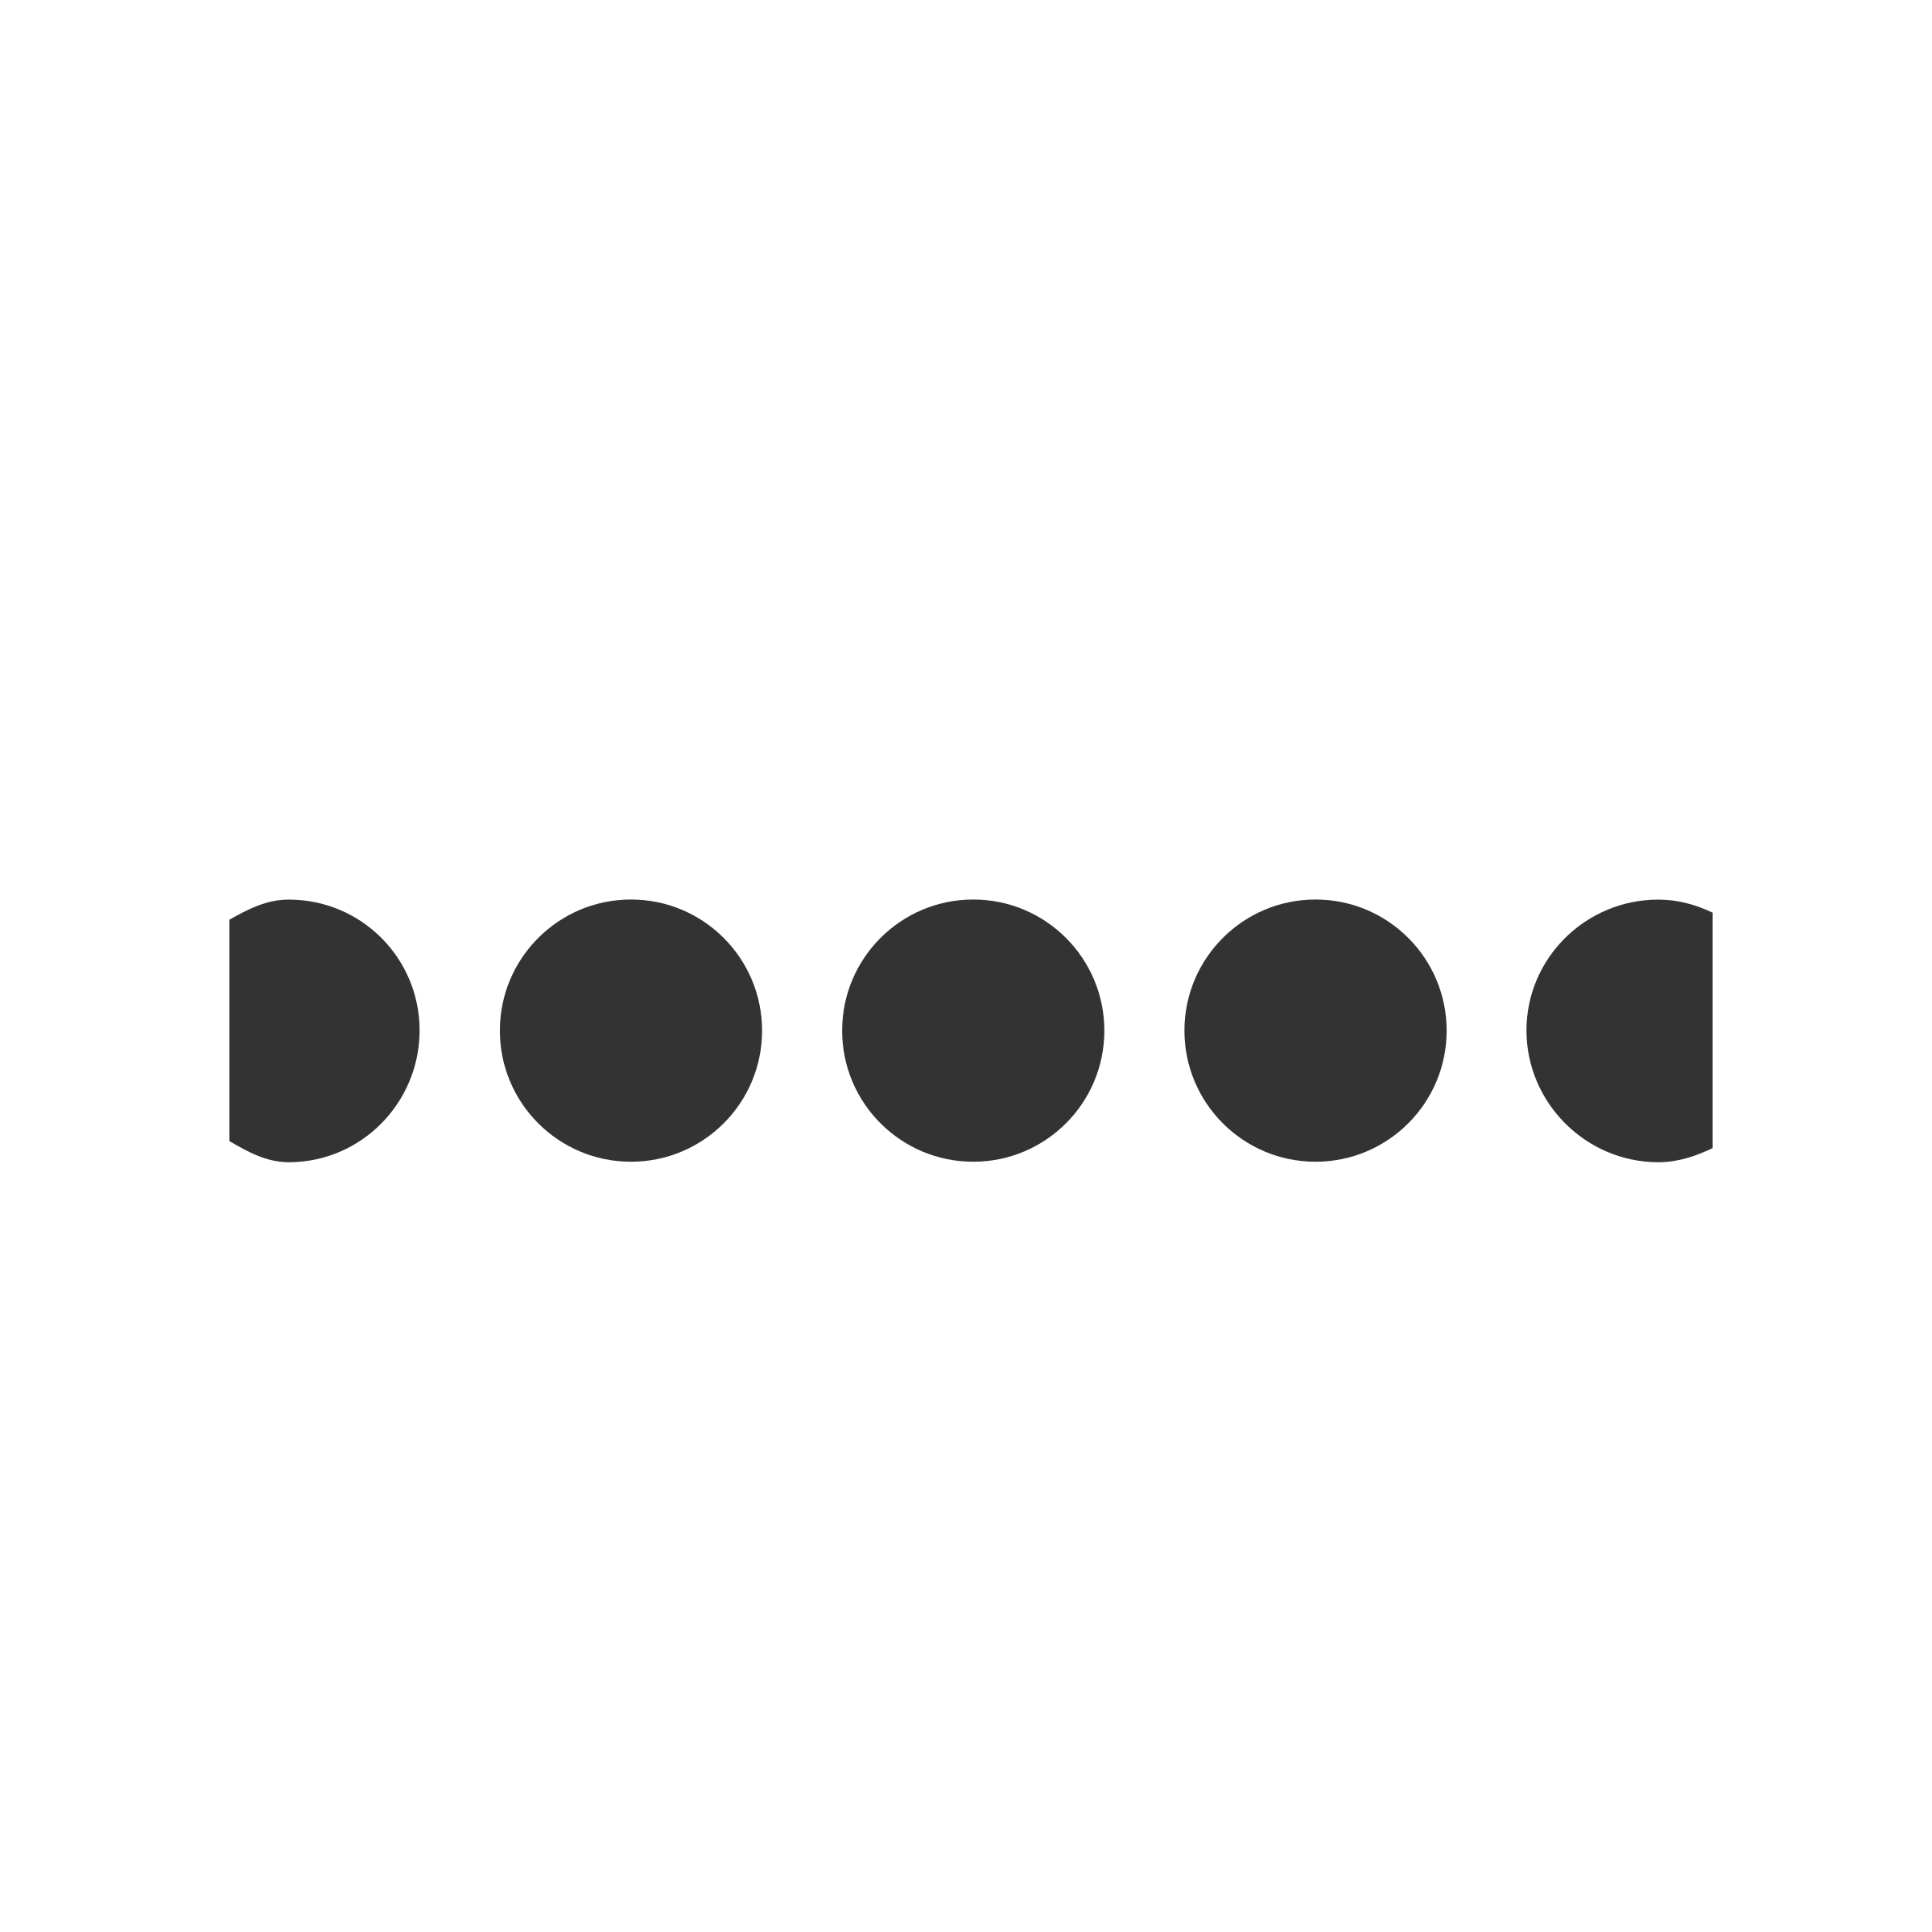 Line polka free collection. Dot clipart row dot